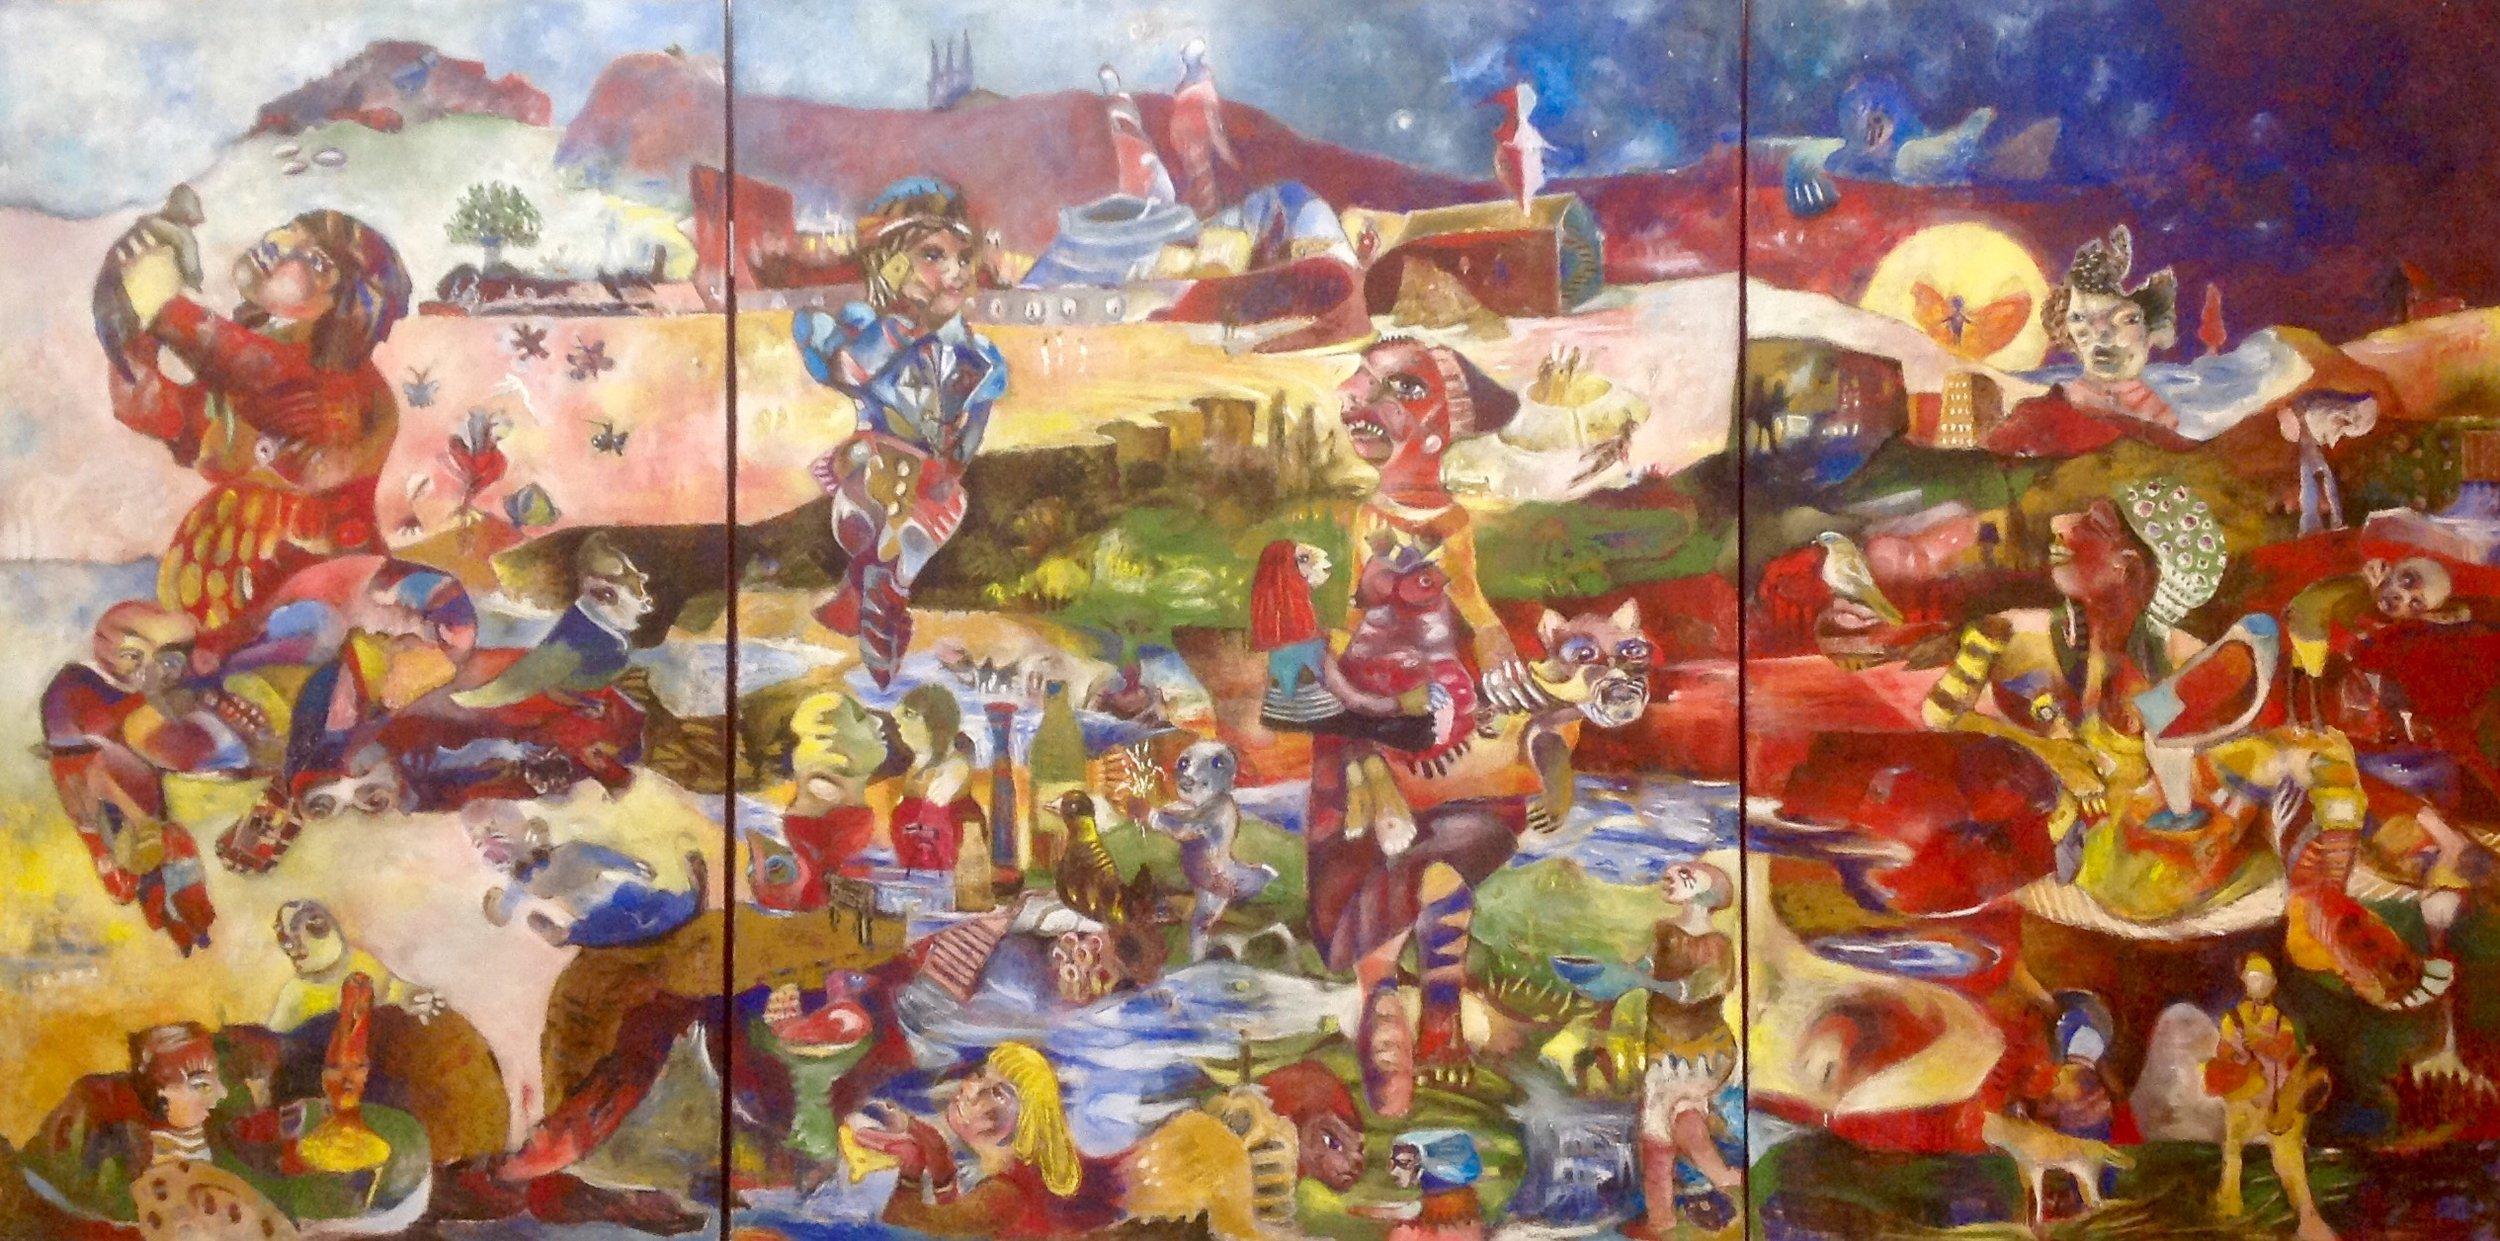 Tyngdekraft, Oil on canvas, 250x500cm